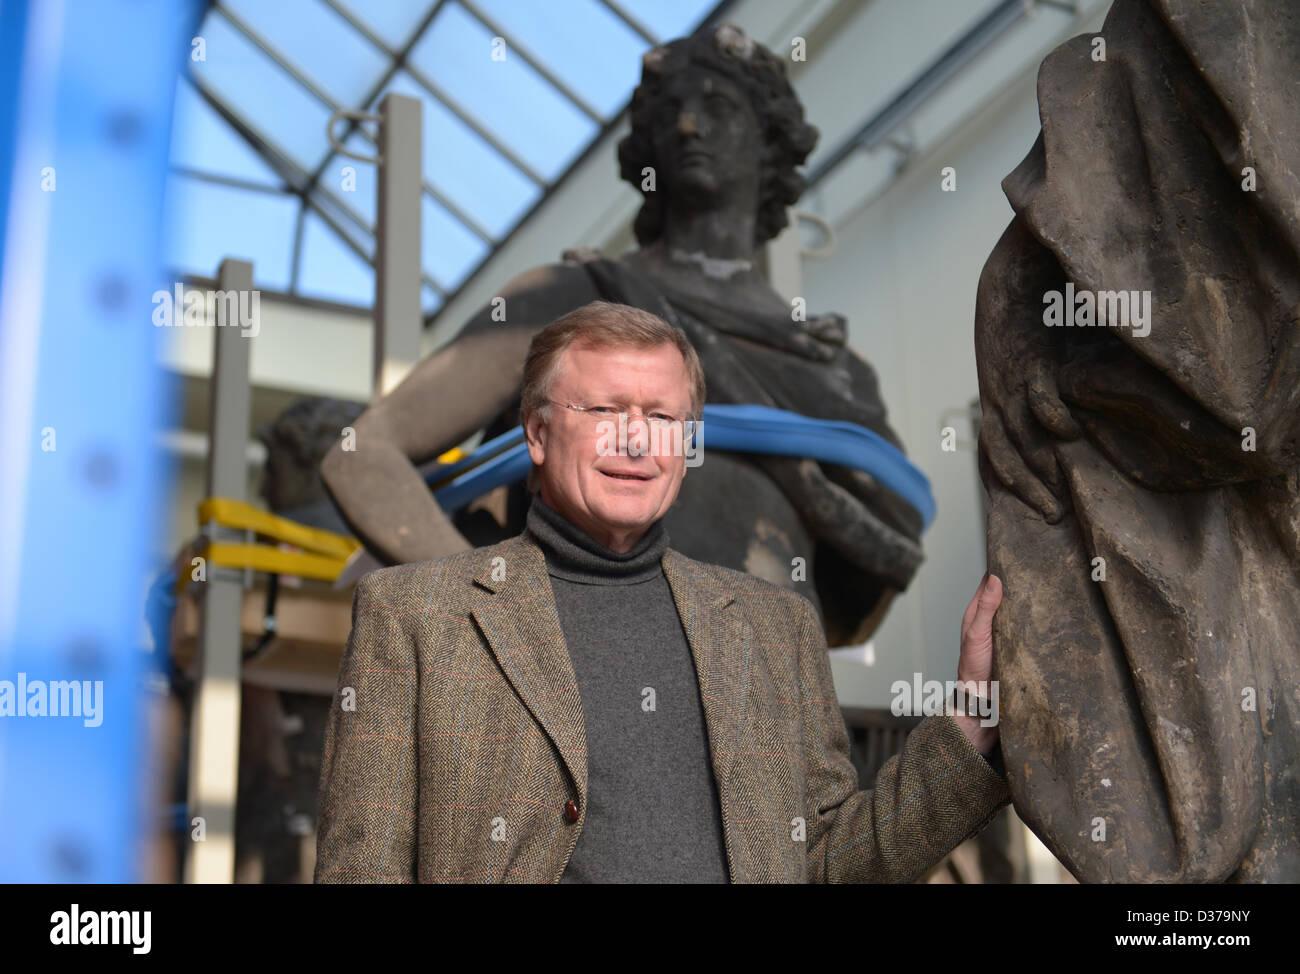 Dean and spokesman of the 'Stiftung Berliner Schloss - Humboldtforum' ('Berlin Castle foundation - Hmboldt forum') Stock Photo